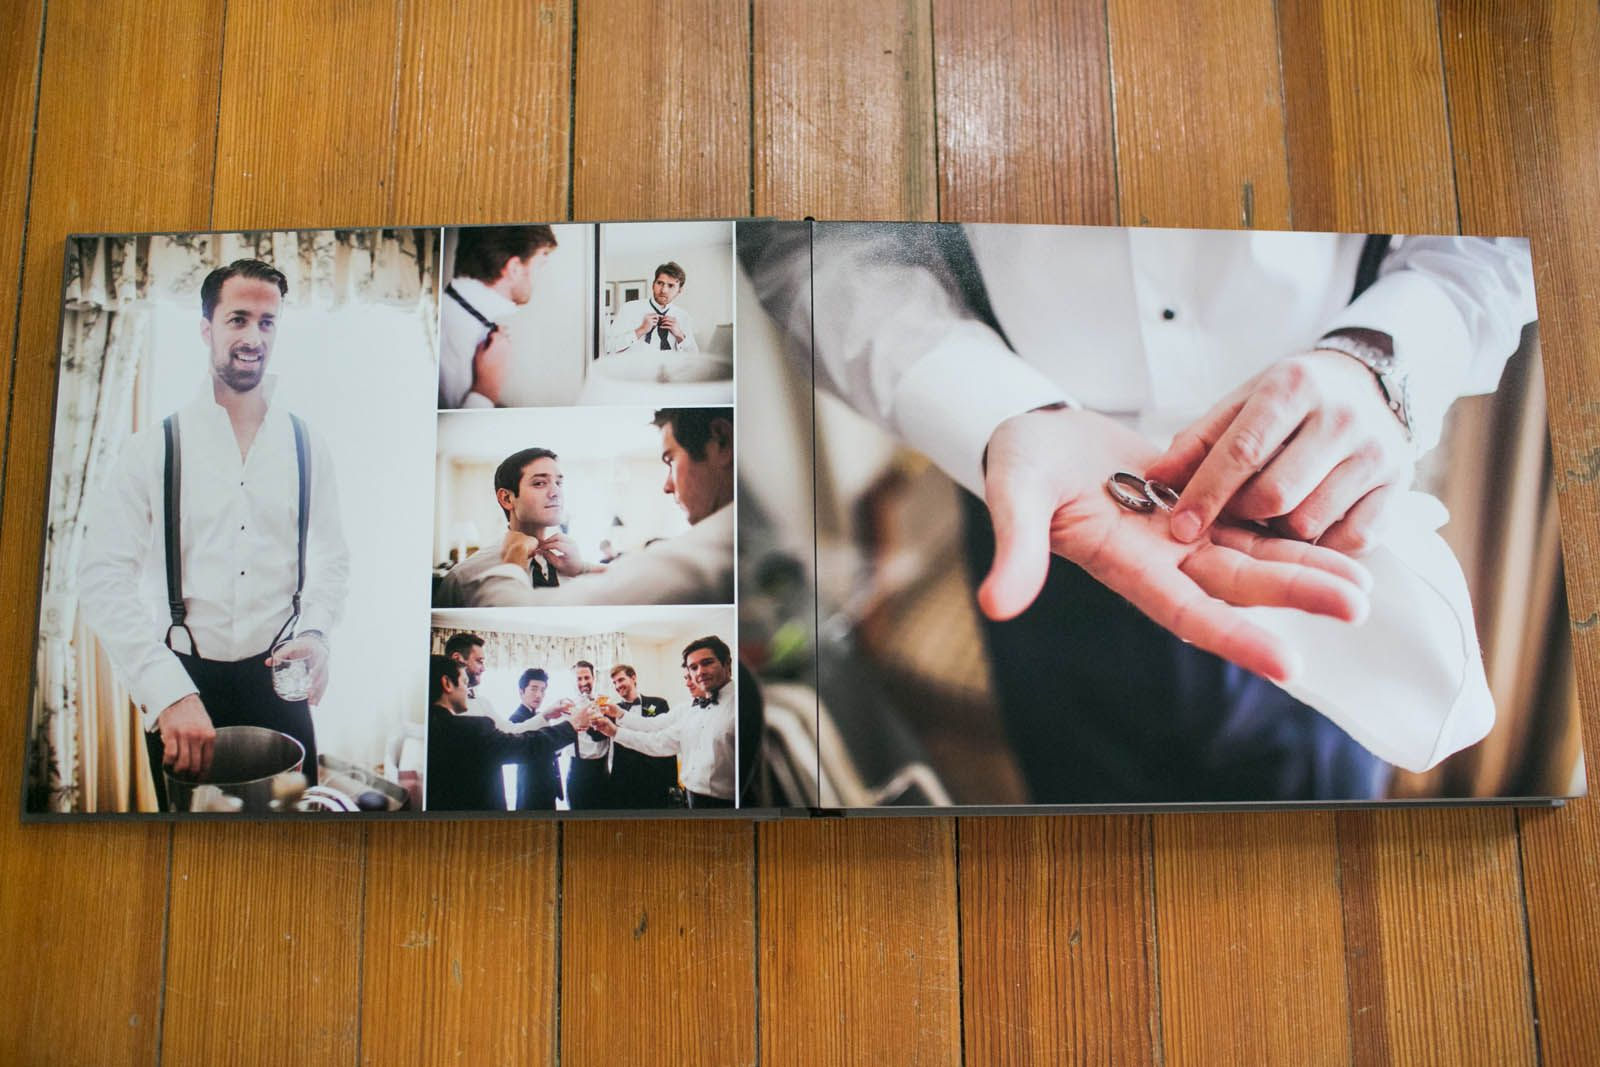 Boston flush mount wedding album designer Zev Fisher creates